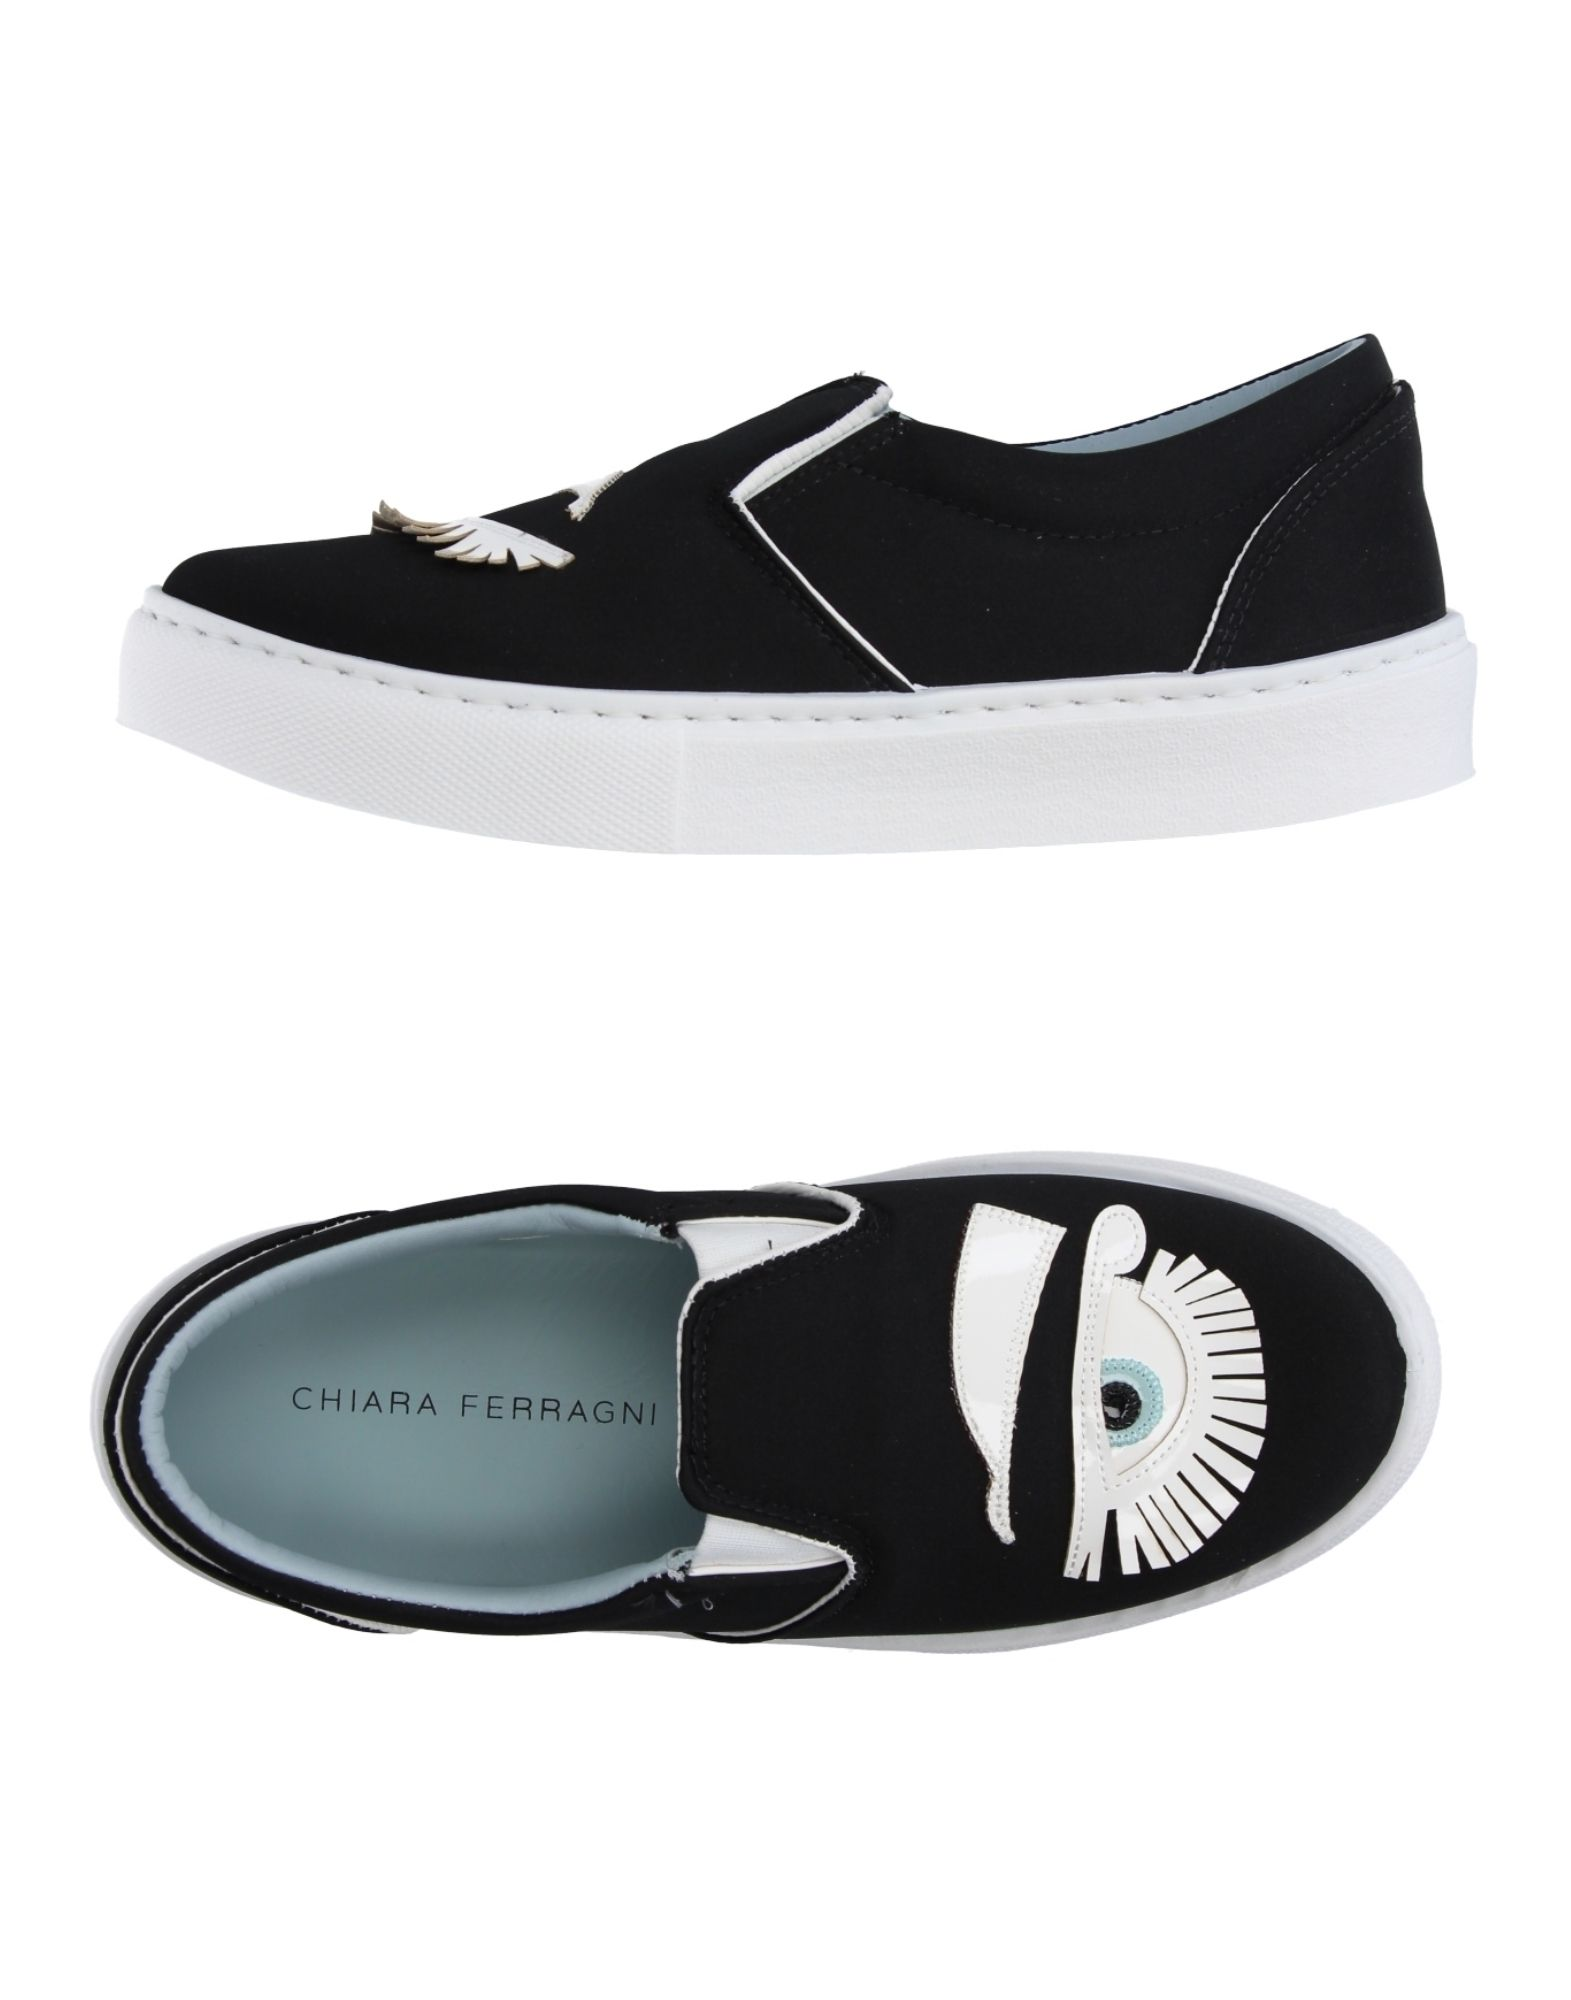 Chiara on Ferragni Sneakers - Women Chiara Ferragni Sneakers online on Chiara  Australia - 11205703LM 5954bc